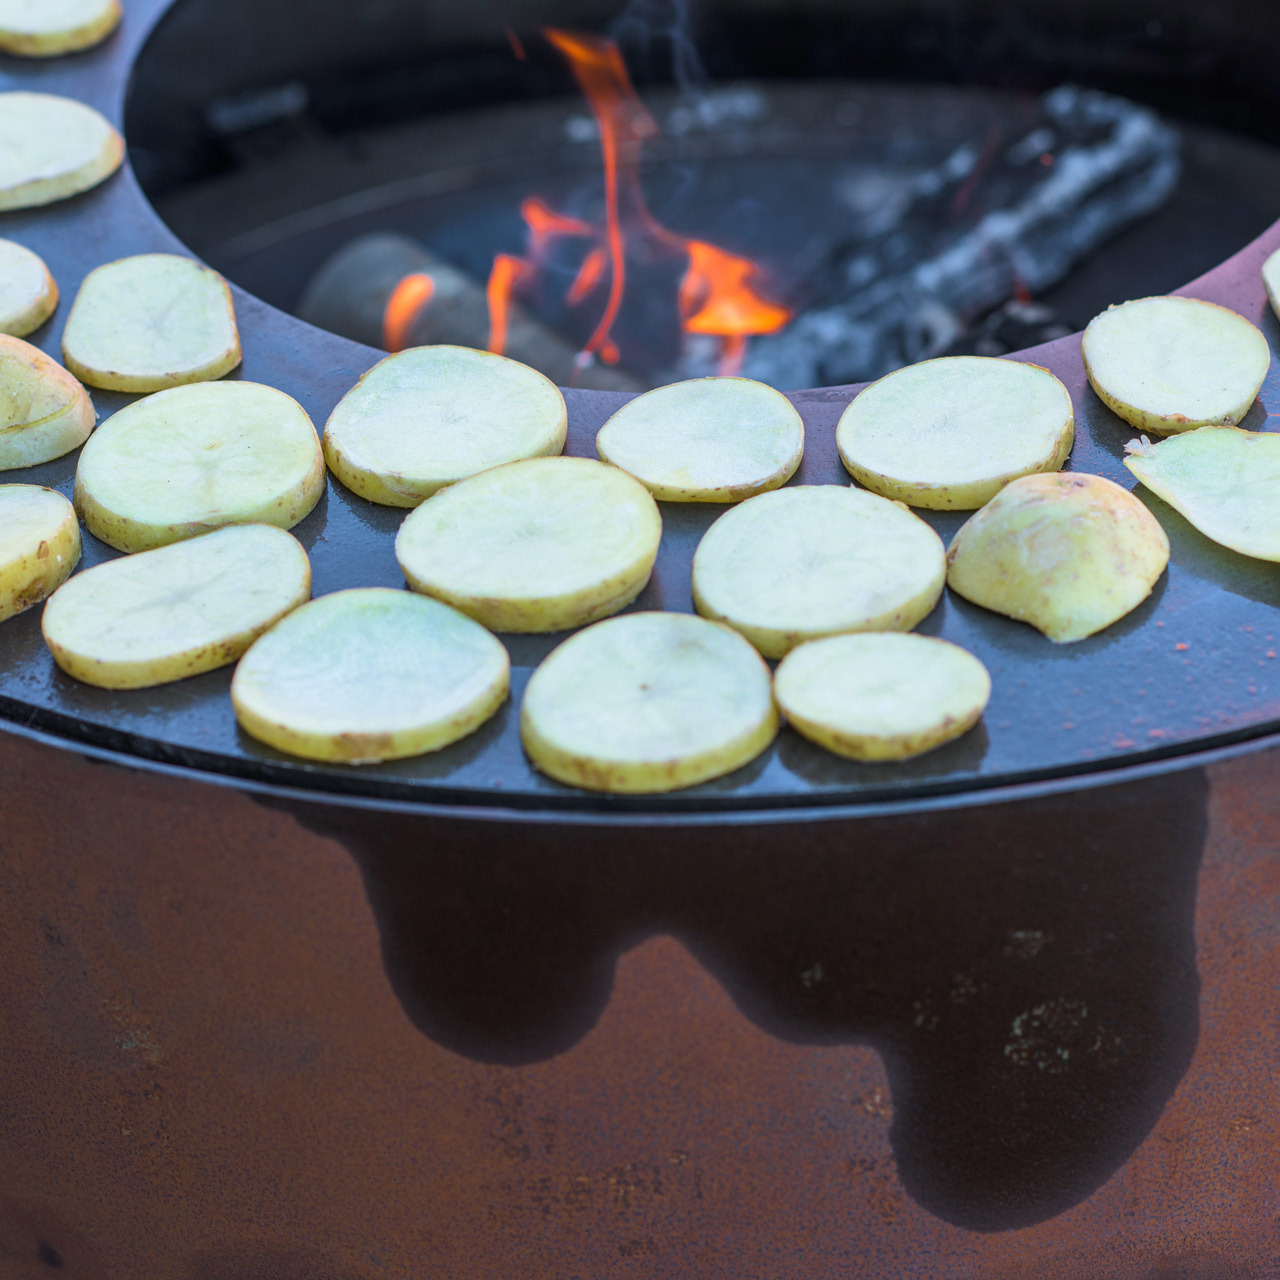 Hohe Feuerstelle 'Eldur Garden Fire Pro'